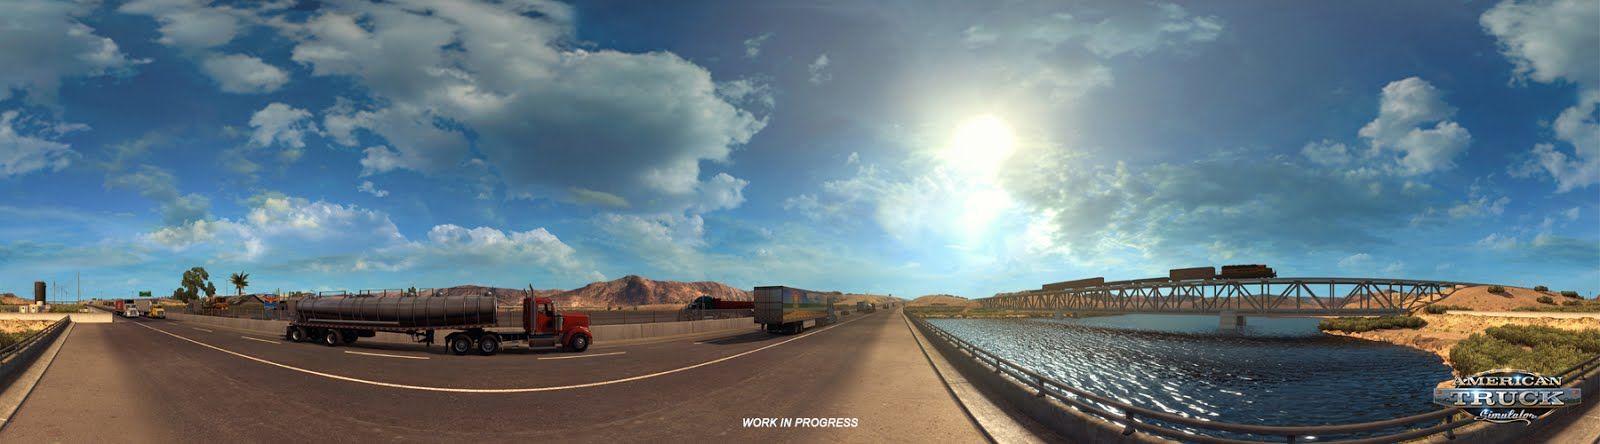 American Truck Simulator: панорамы из Arizona DLC